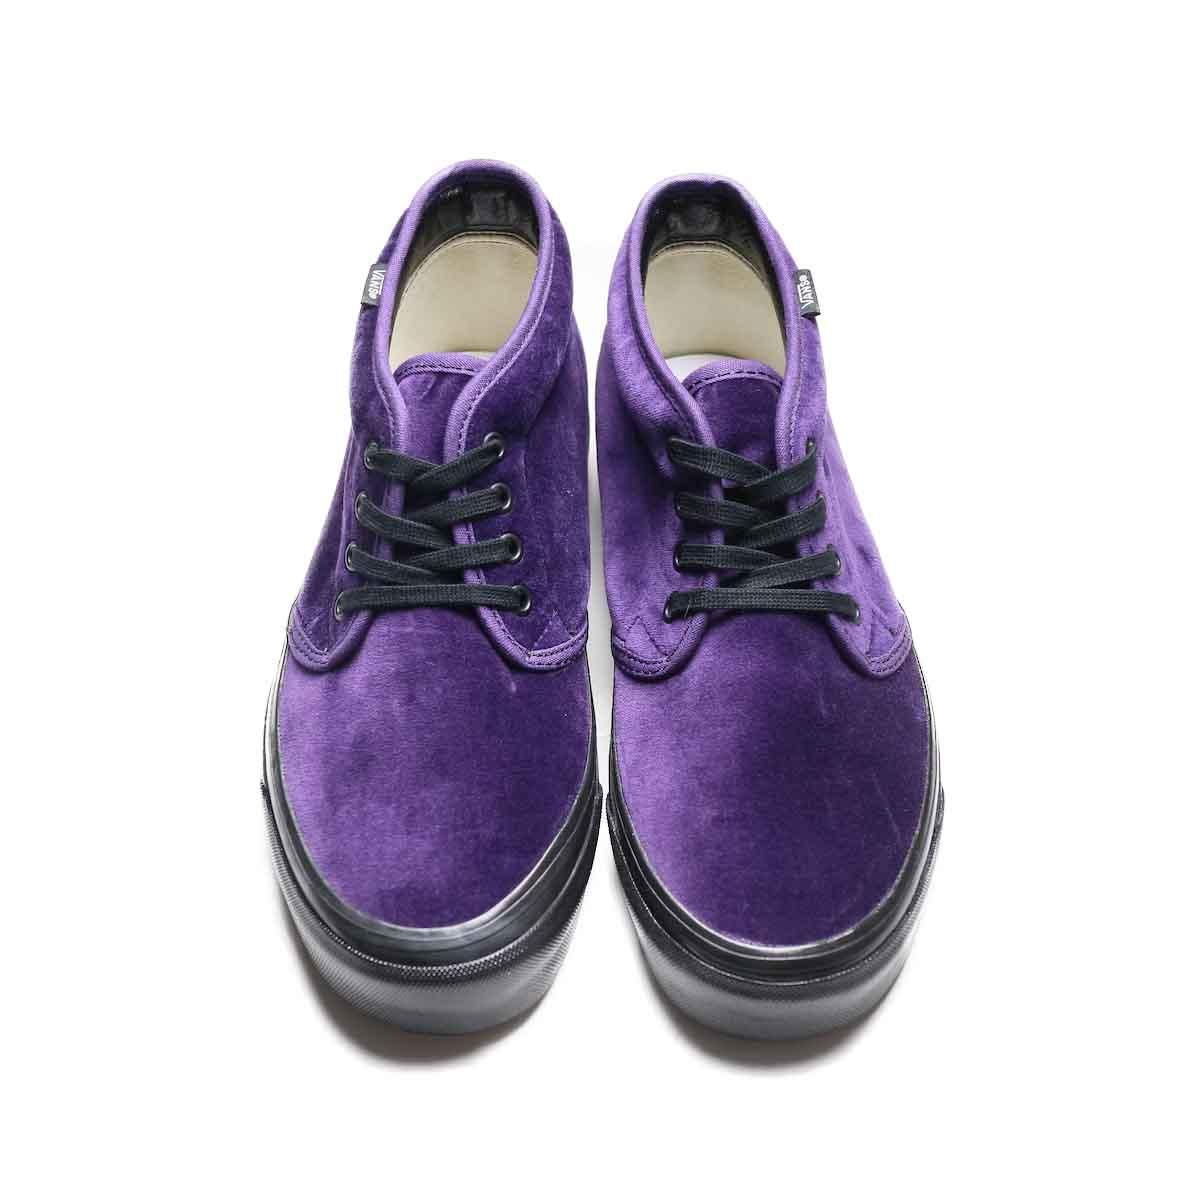 VANS / CHUKKA 49 DX (ANAHEIM FACTORY) (Purple VELVET)正面